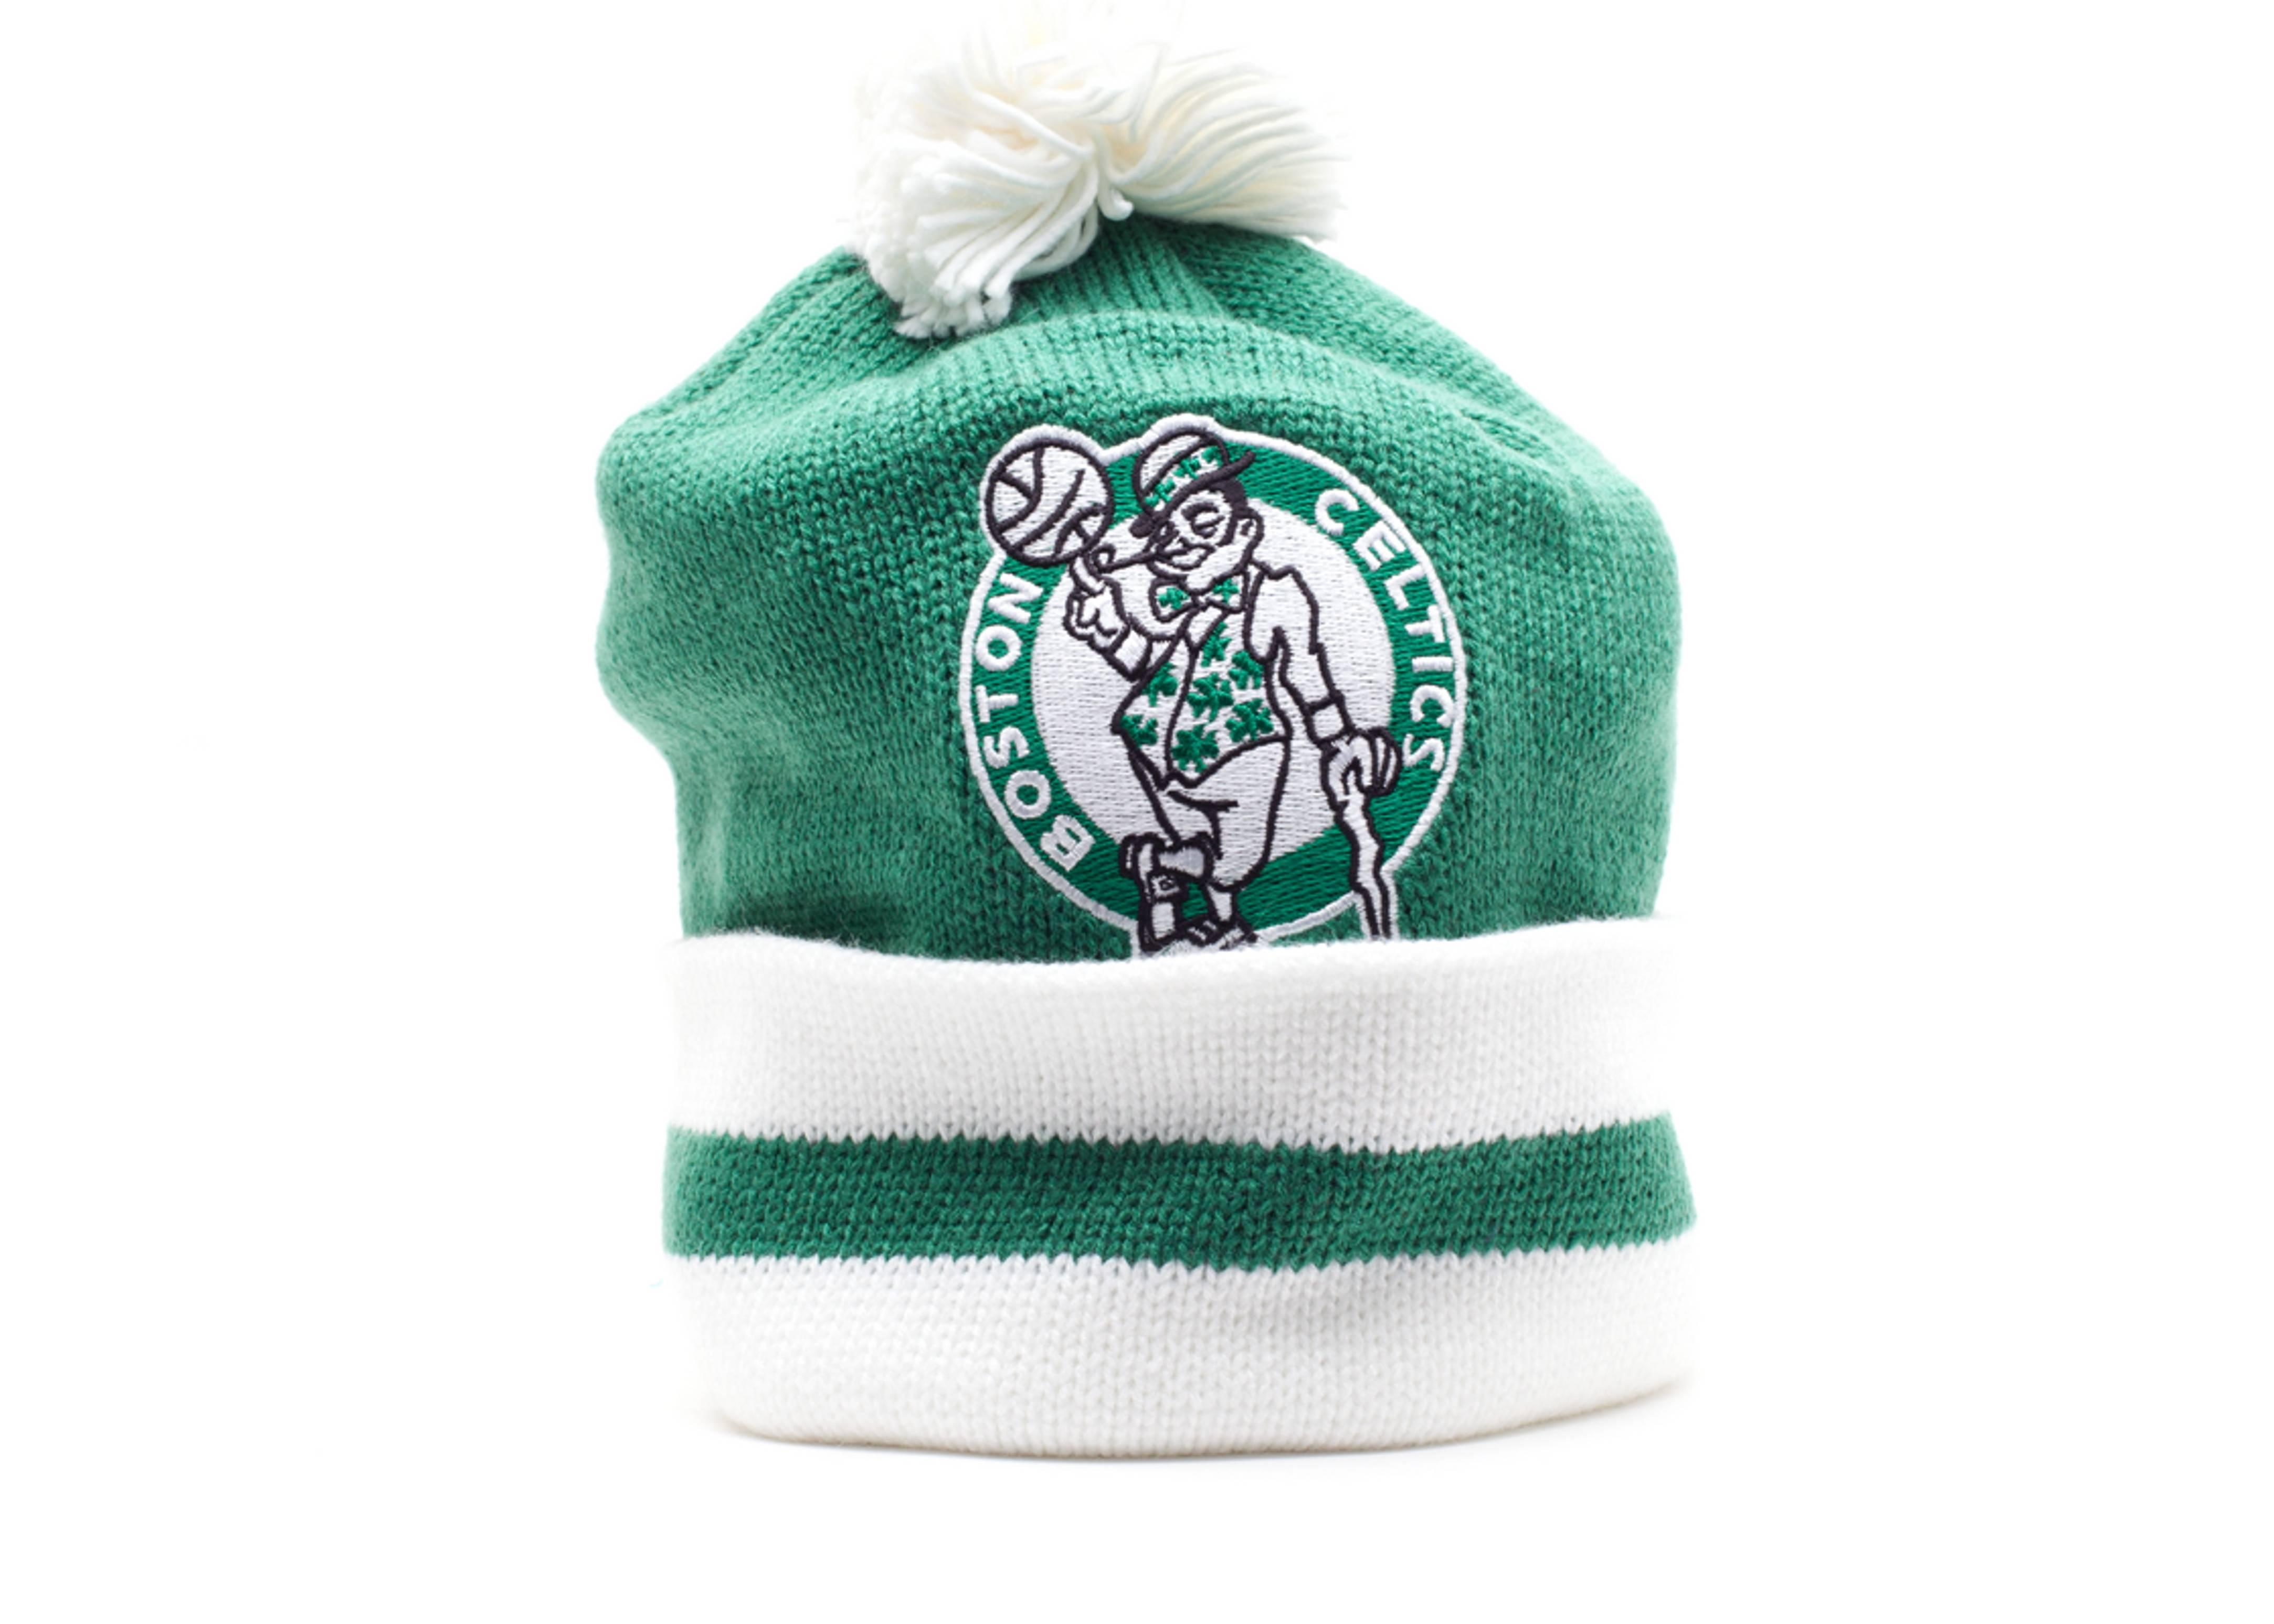 Boston Celtics Cuffed Pom Knit Beanie - Mitchell   Ness - ke31mtc5celti -  green white  6b8d27cac03a